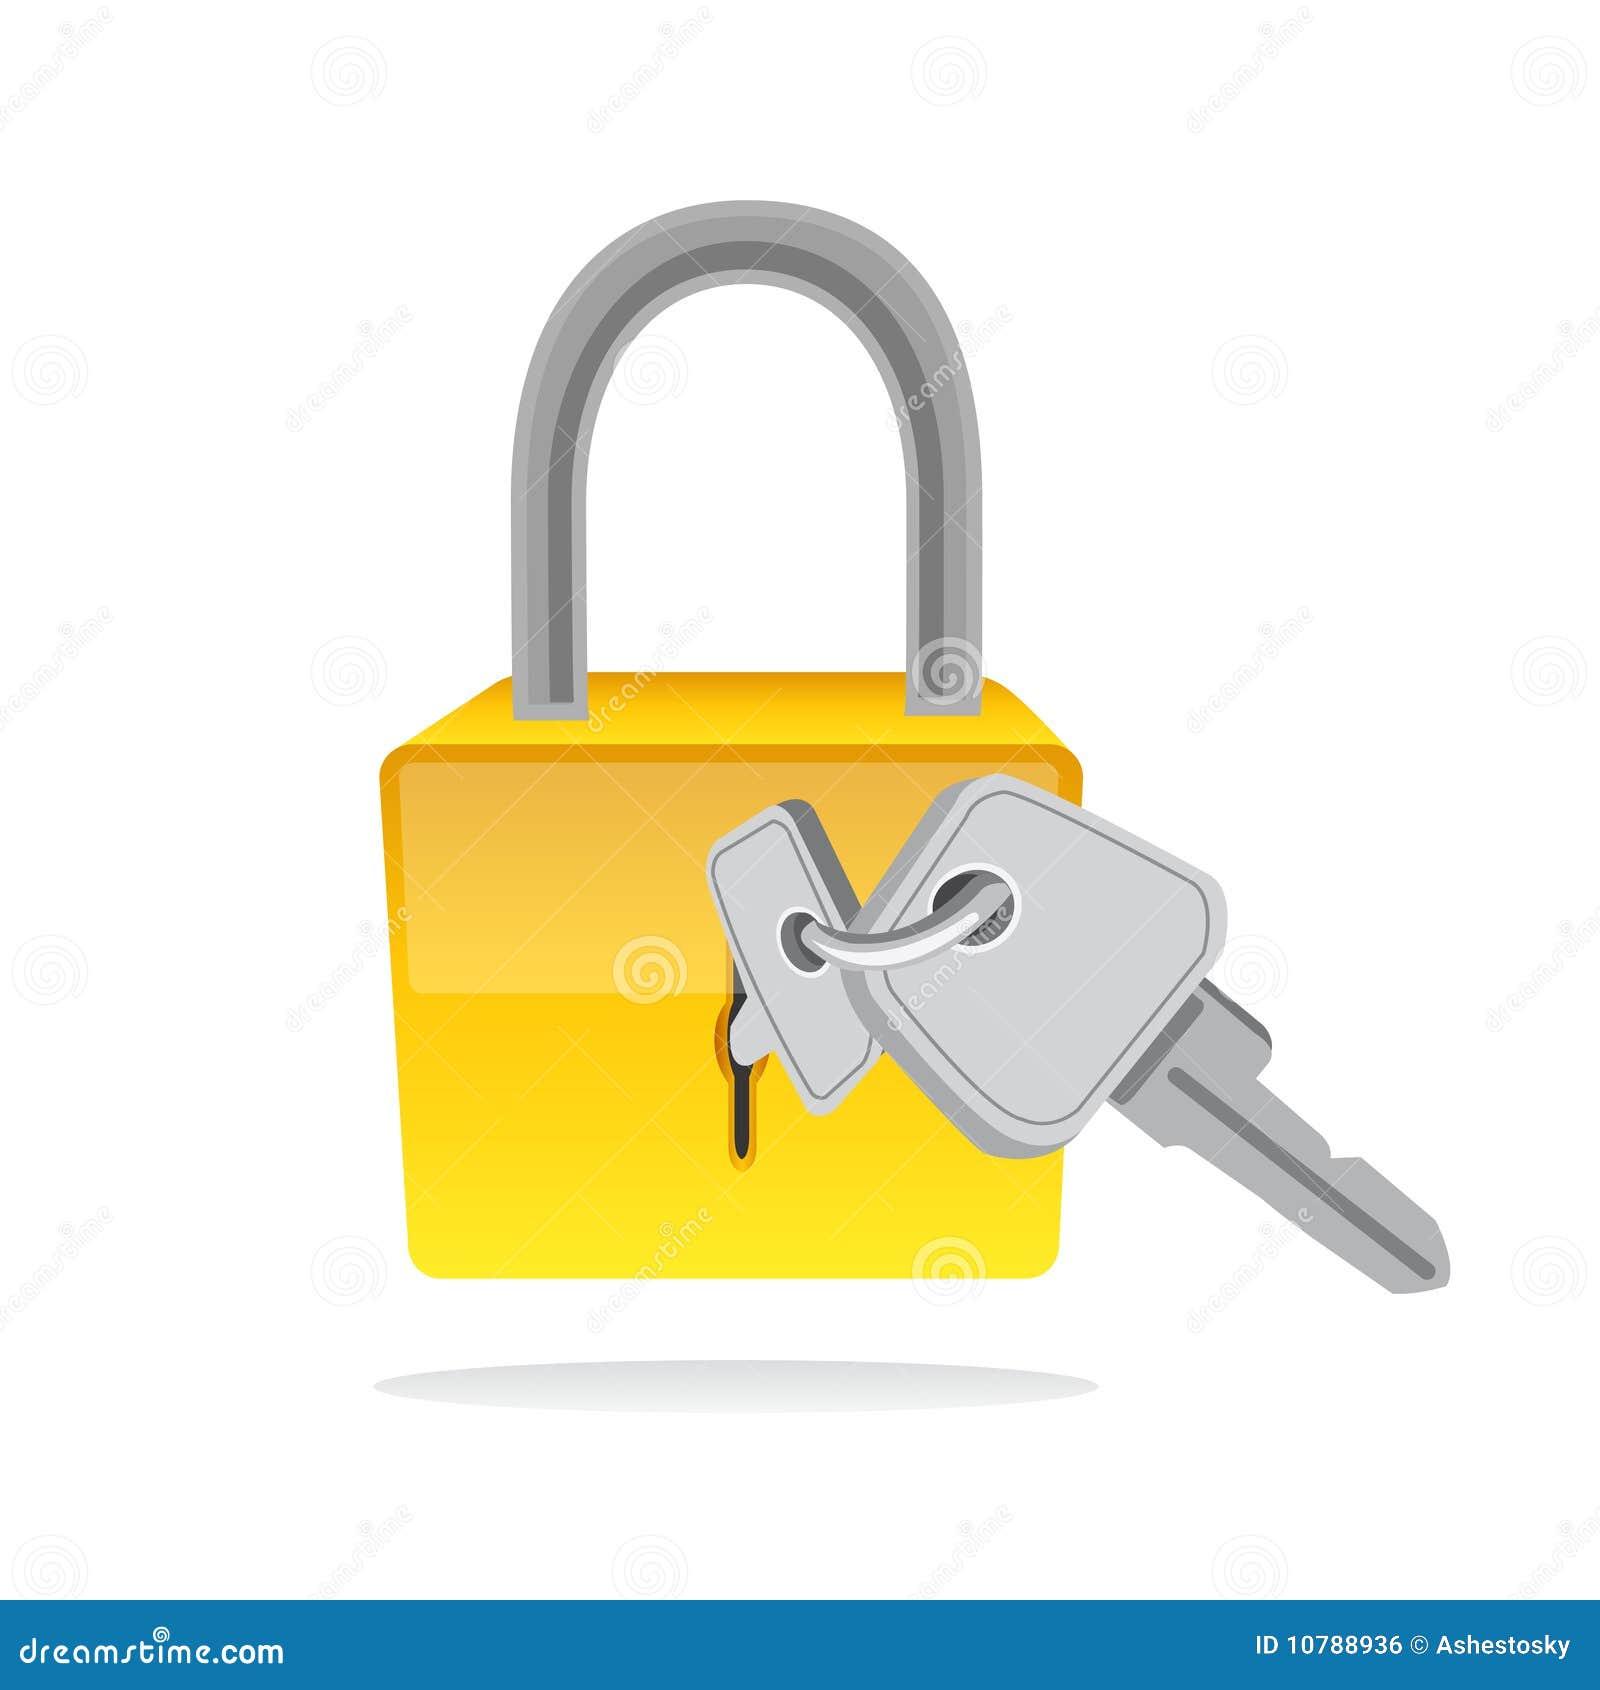 padlock and key clipart - photo #25